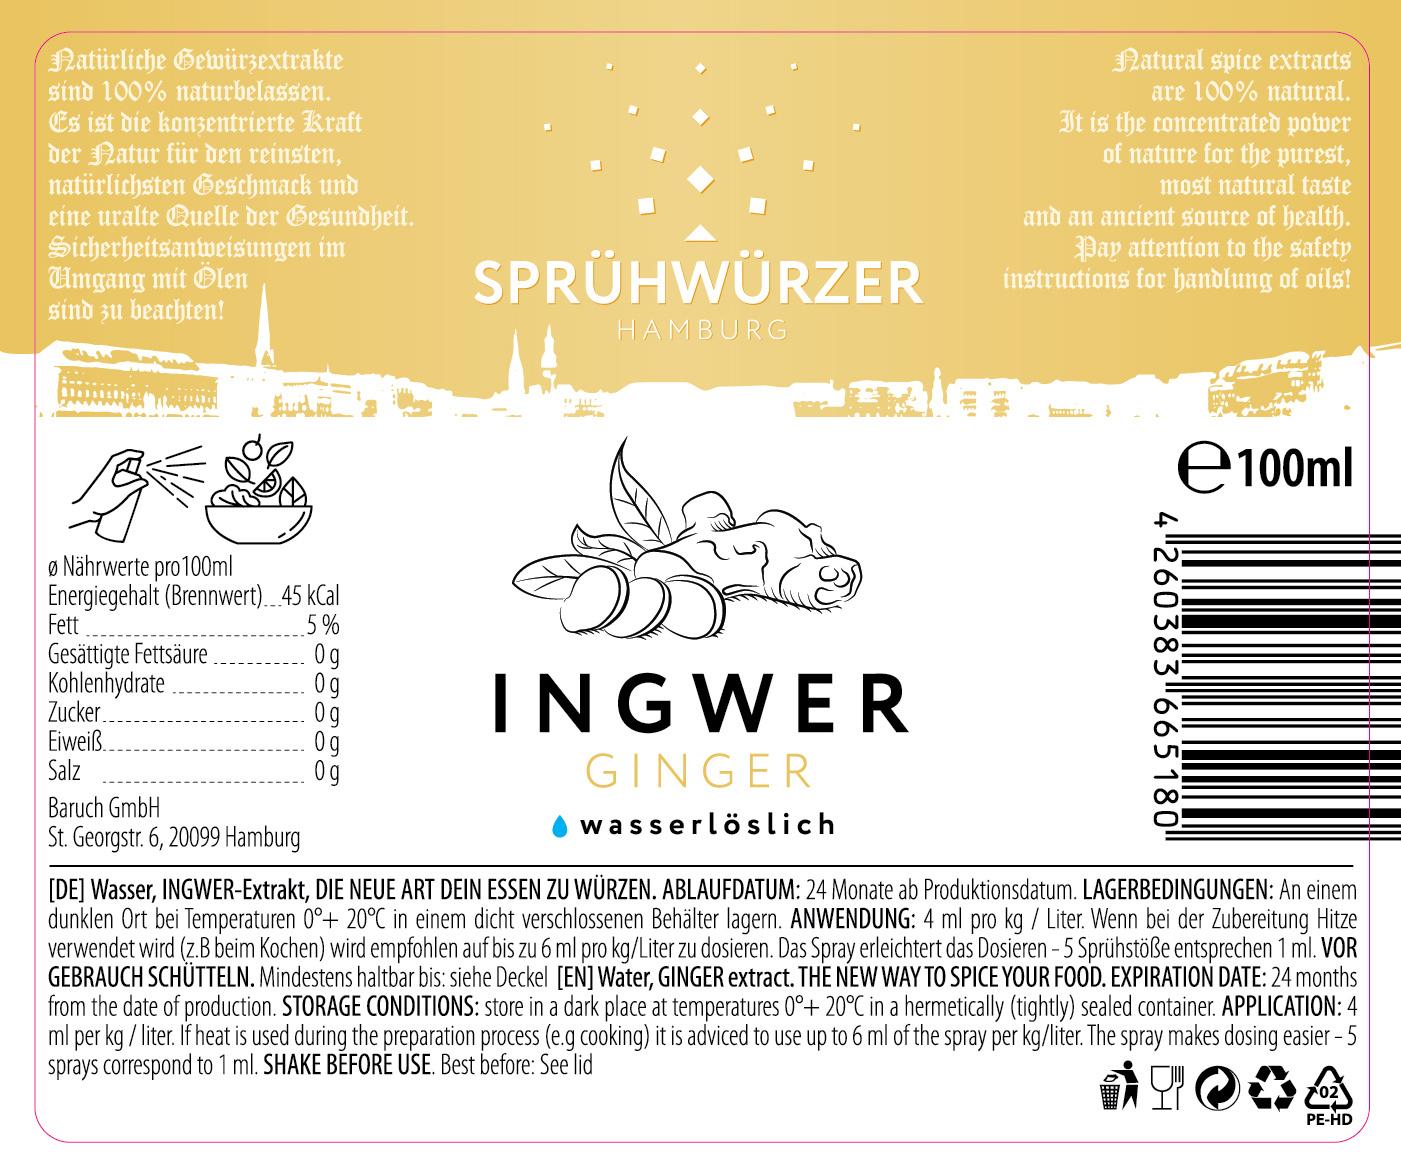 Ingwer-Extrakt 100ml